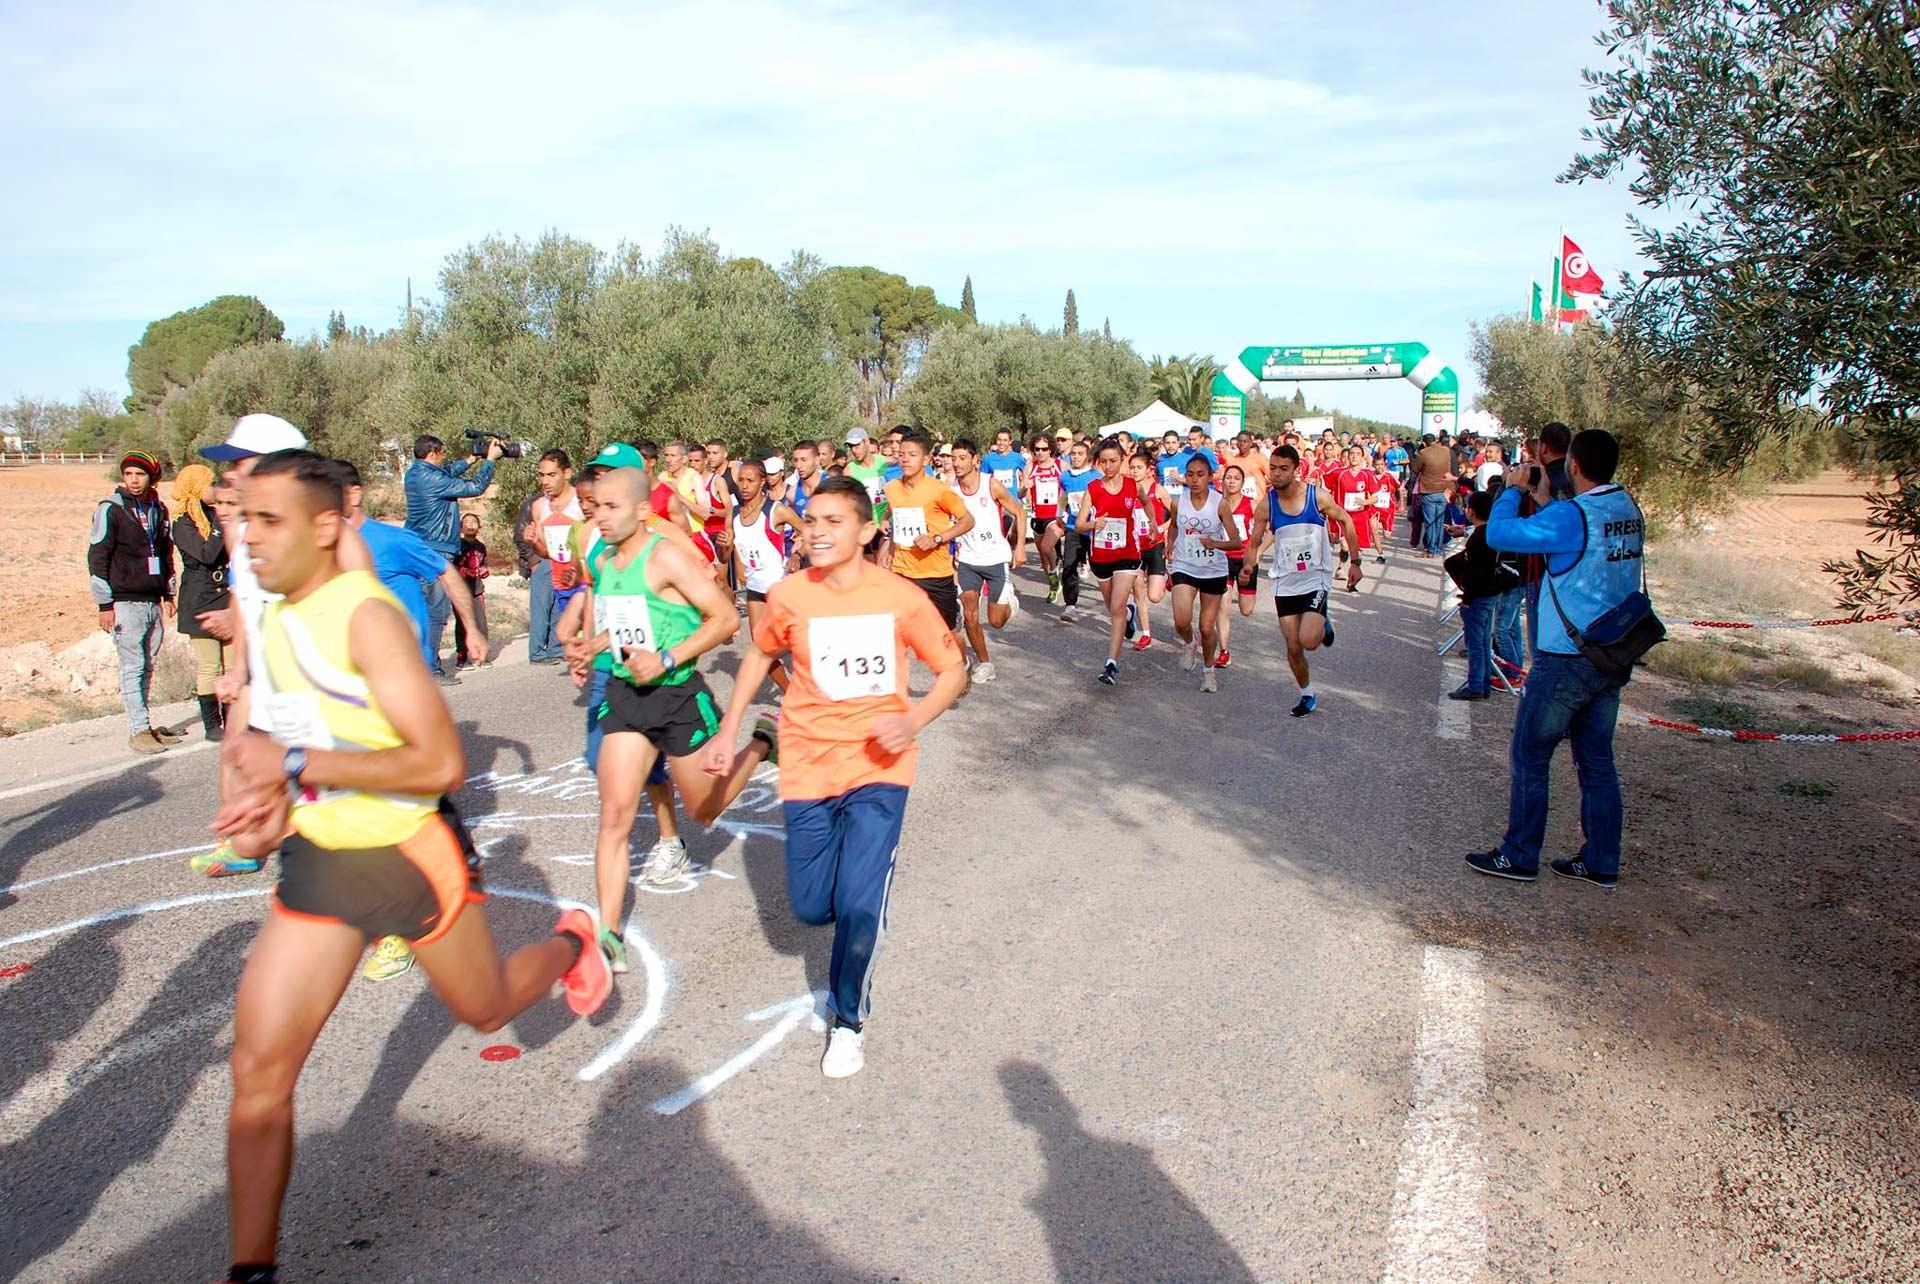 gherib-brahim-wins-marathon-of-the-olive-trees